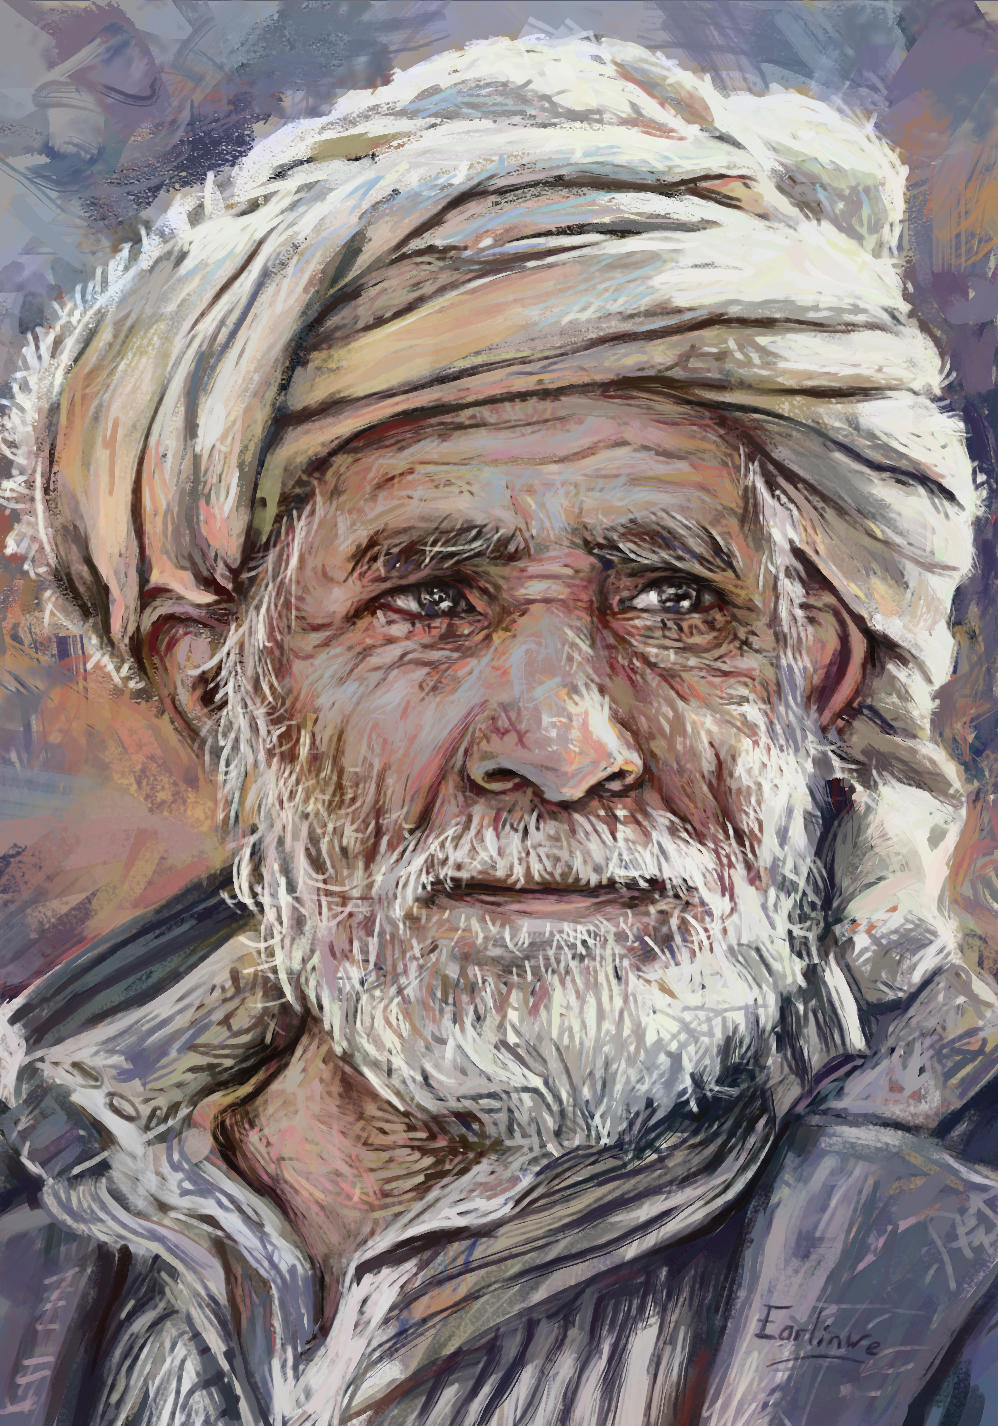 Old Man 2 by Harkale-Linai